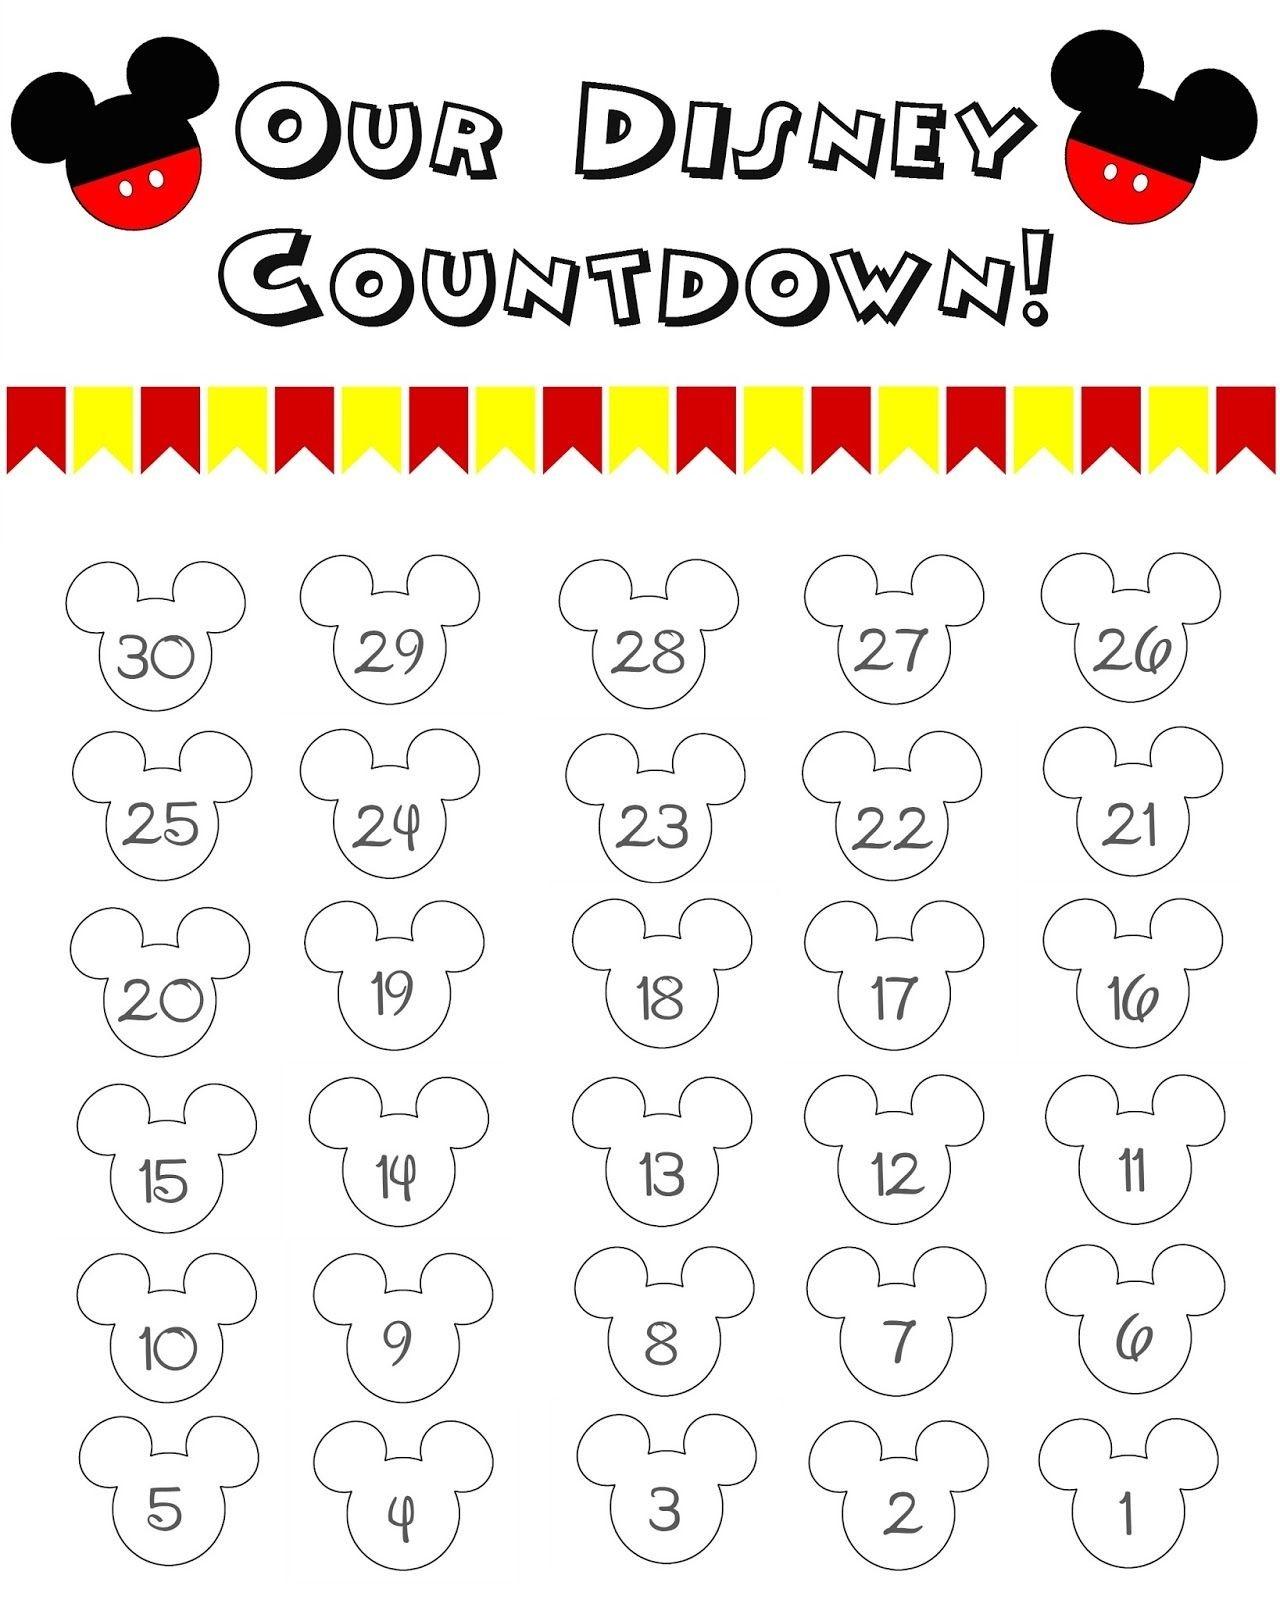 Disney World Countdown Calendar - Free Printable | Disney-Template Countdown Calendar Disney